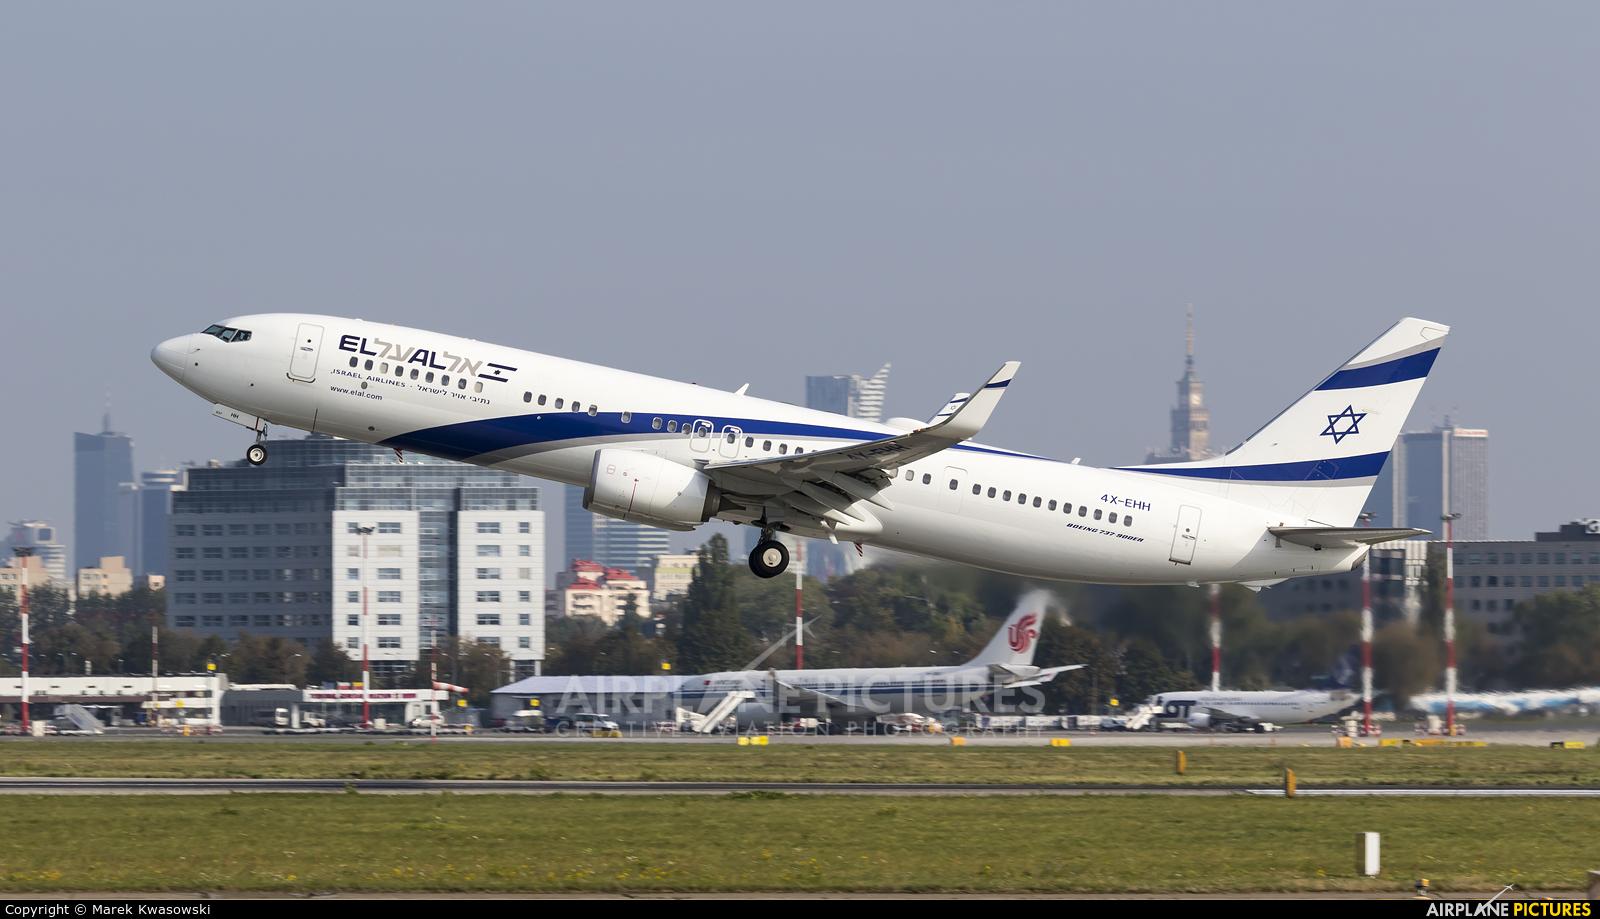 El Al Israel Airlines 4X-EHH aircraft at Warsaw - Frederic Chopin